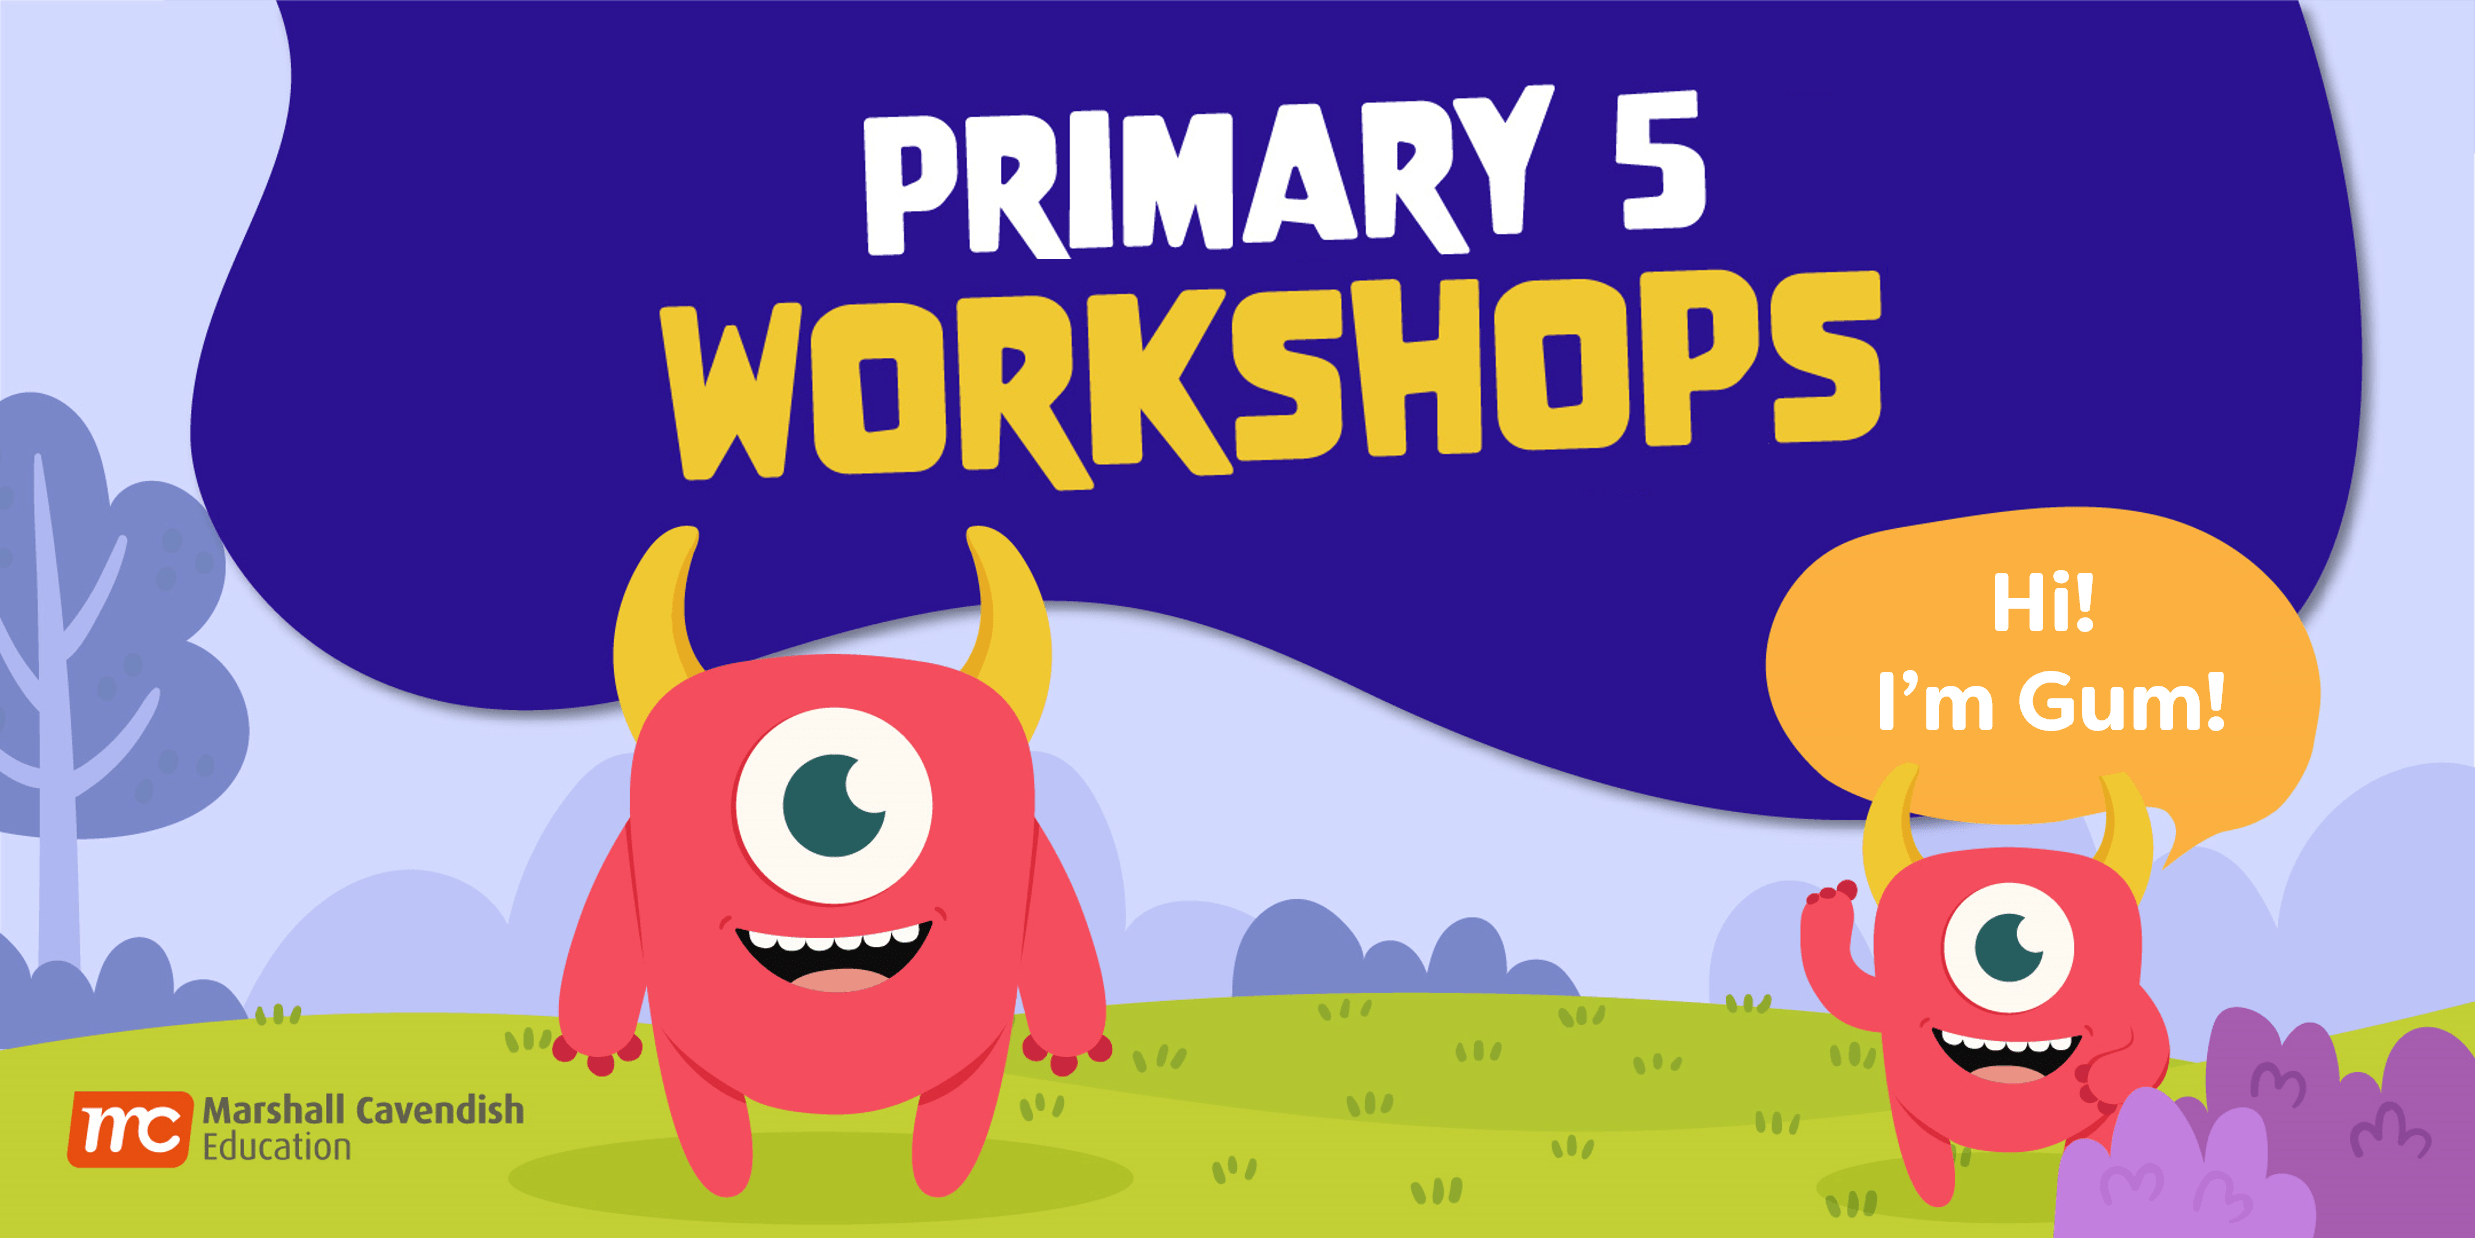 Primary 5 Workshops